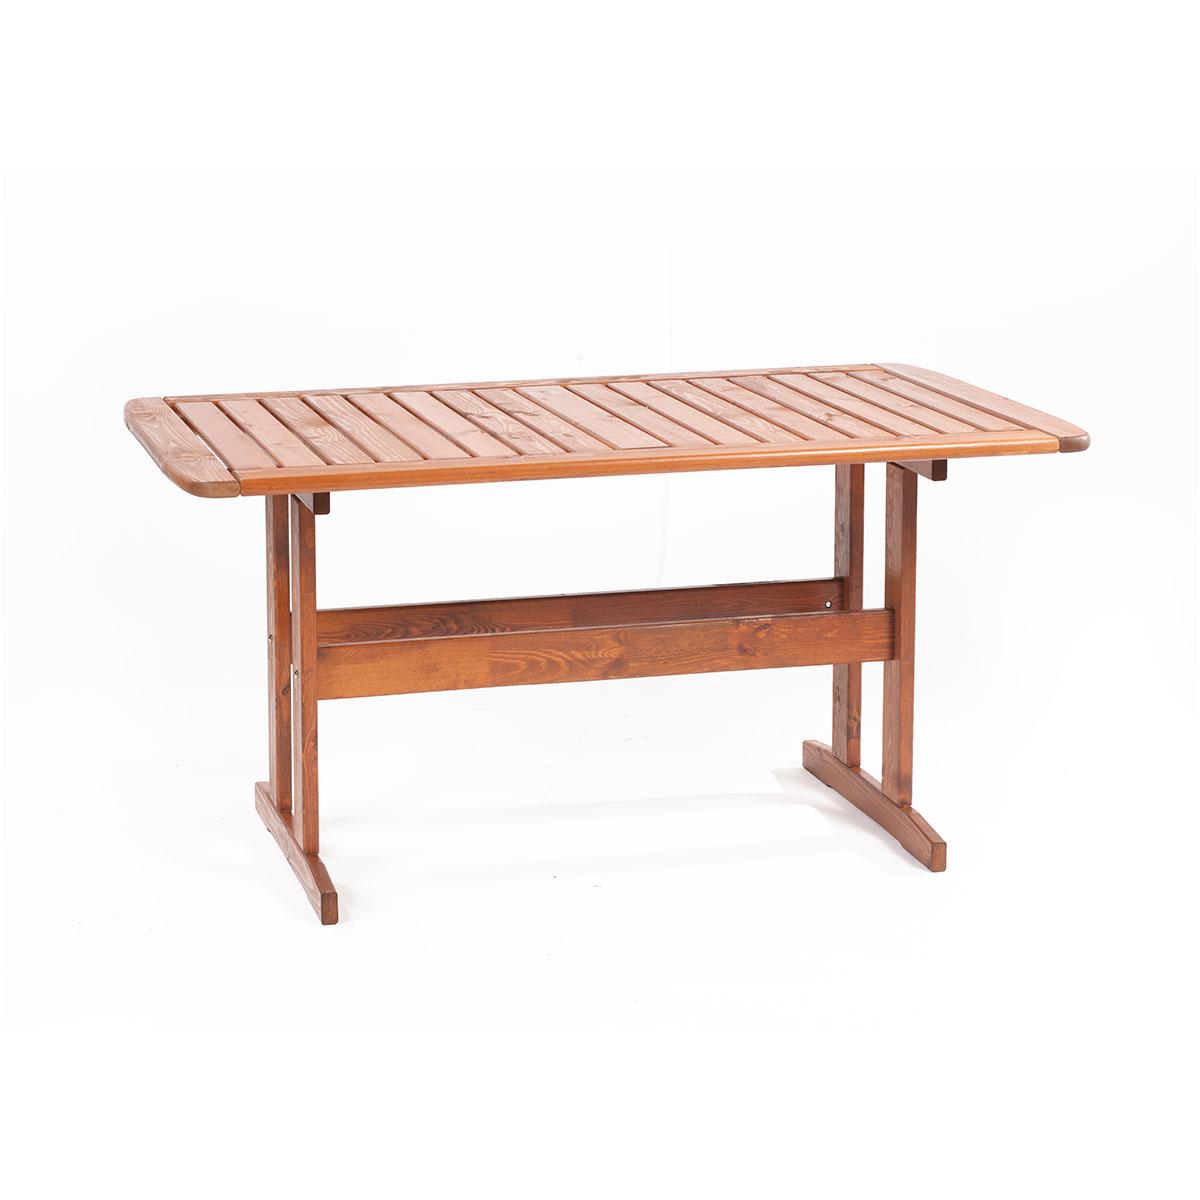 zahradní stůl z borovice 150 x 88 x 73 cm Garland Skeppsvik